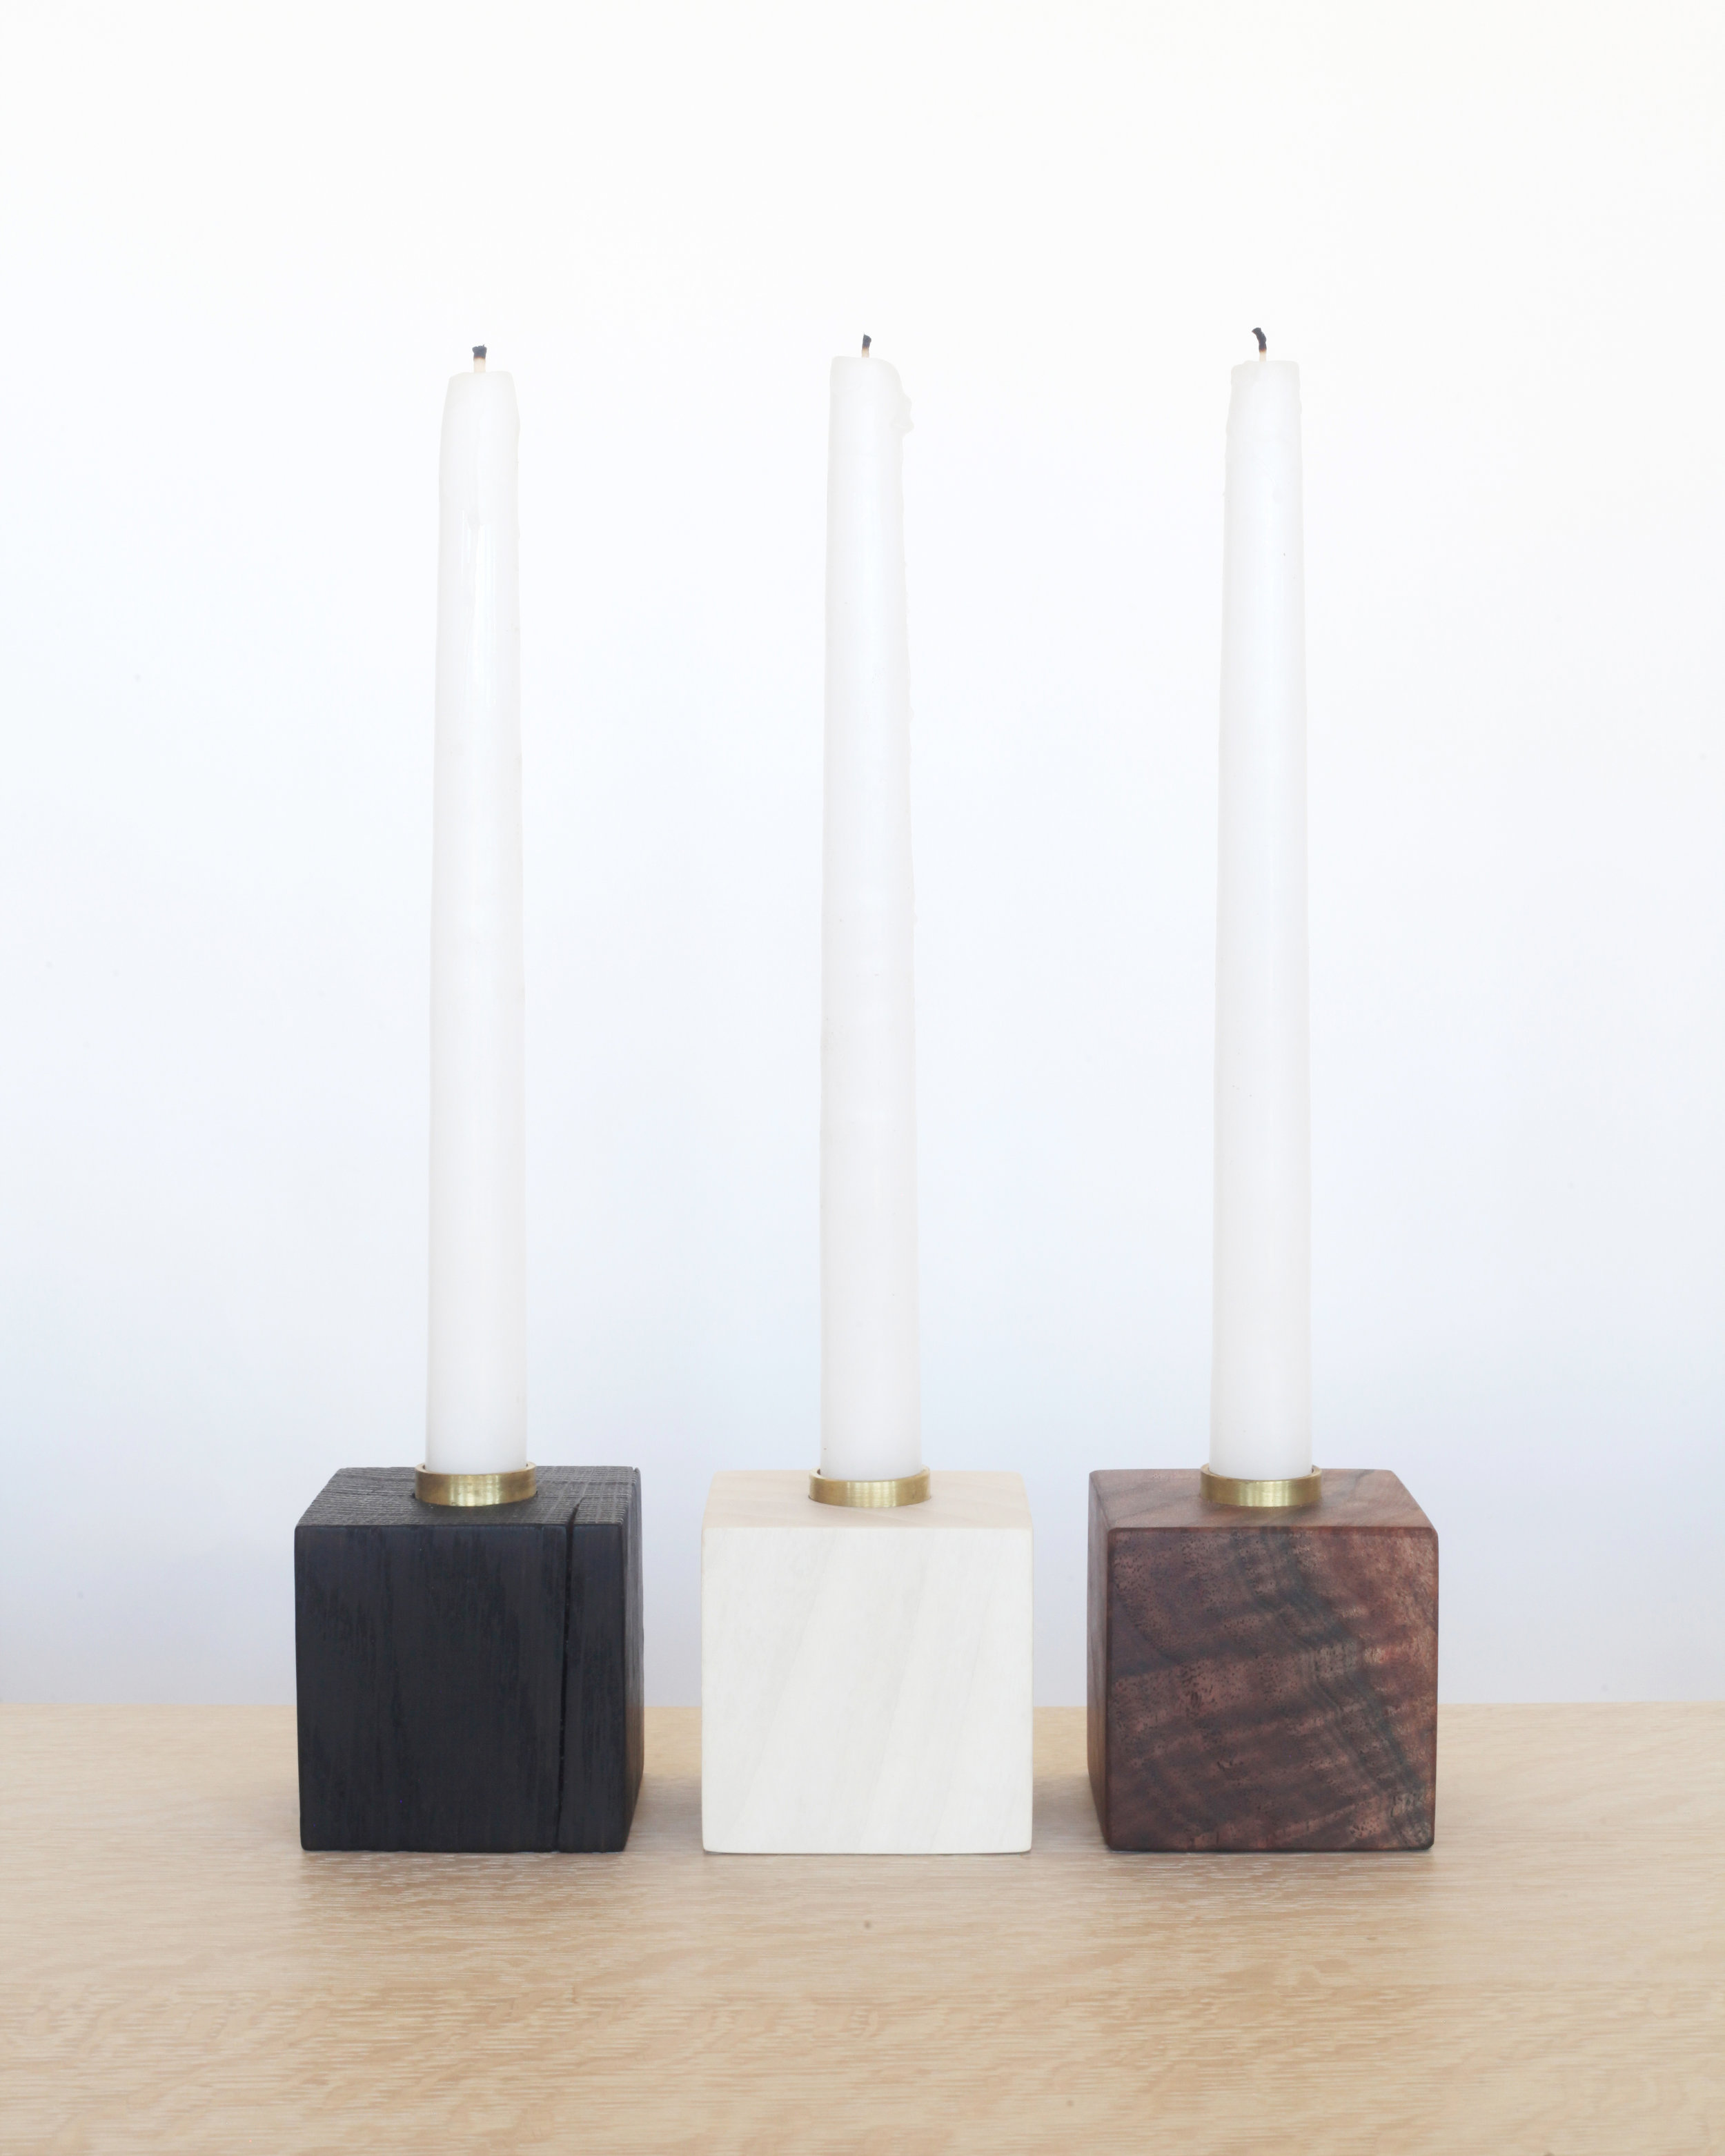 candle holders-  charred oak, bleached ash, natural walnut